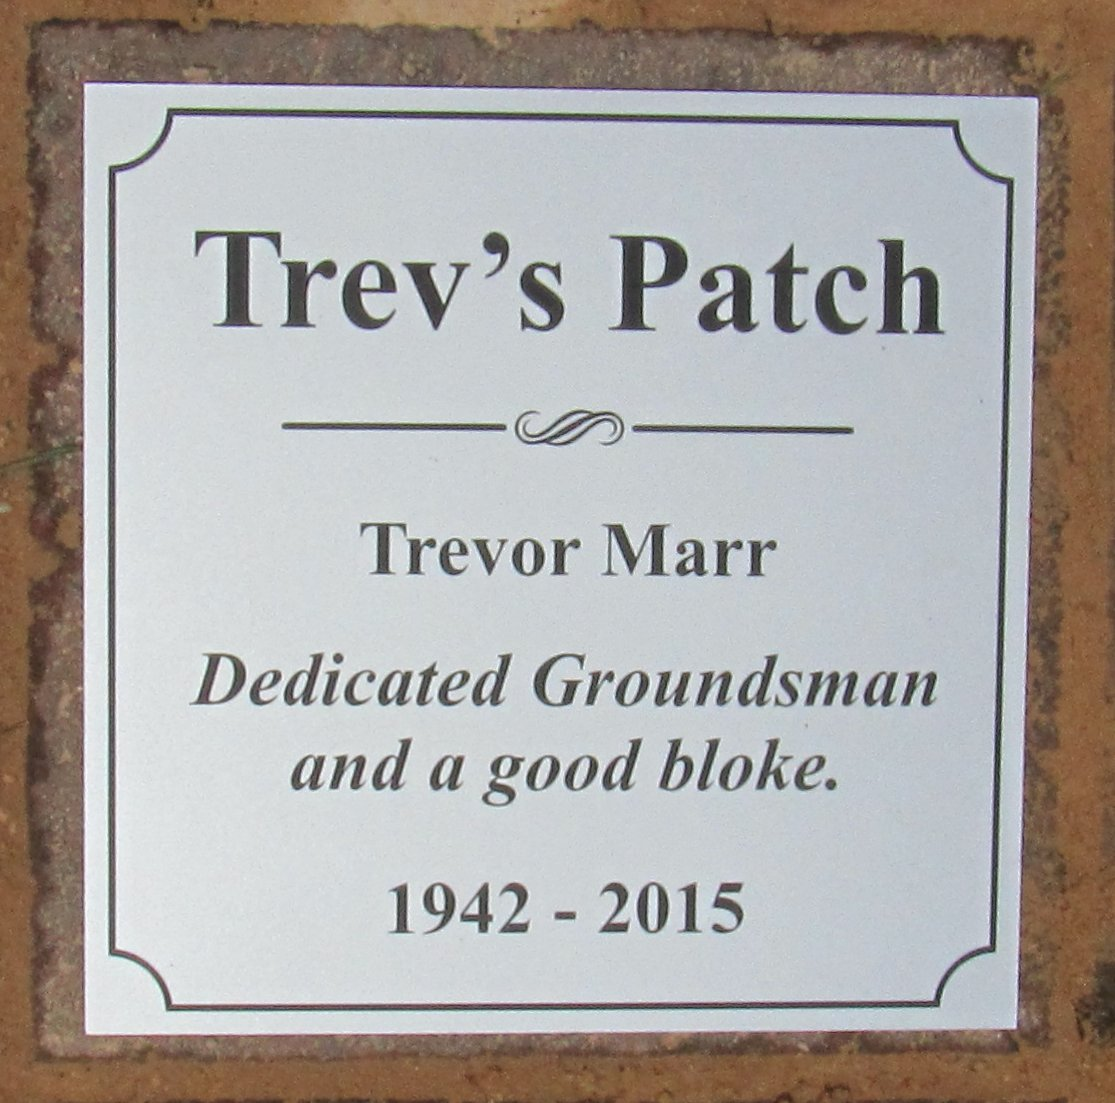 AAM Trevor's Patch -002.JPG